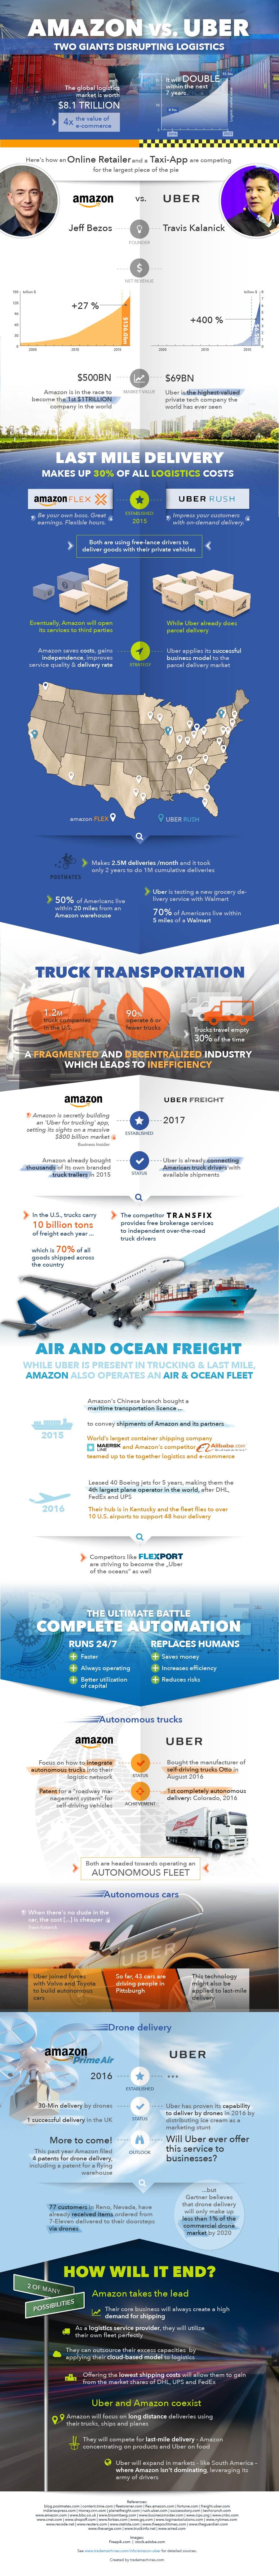 Amazon Logistics and Uber Logistics